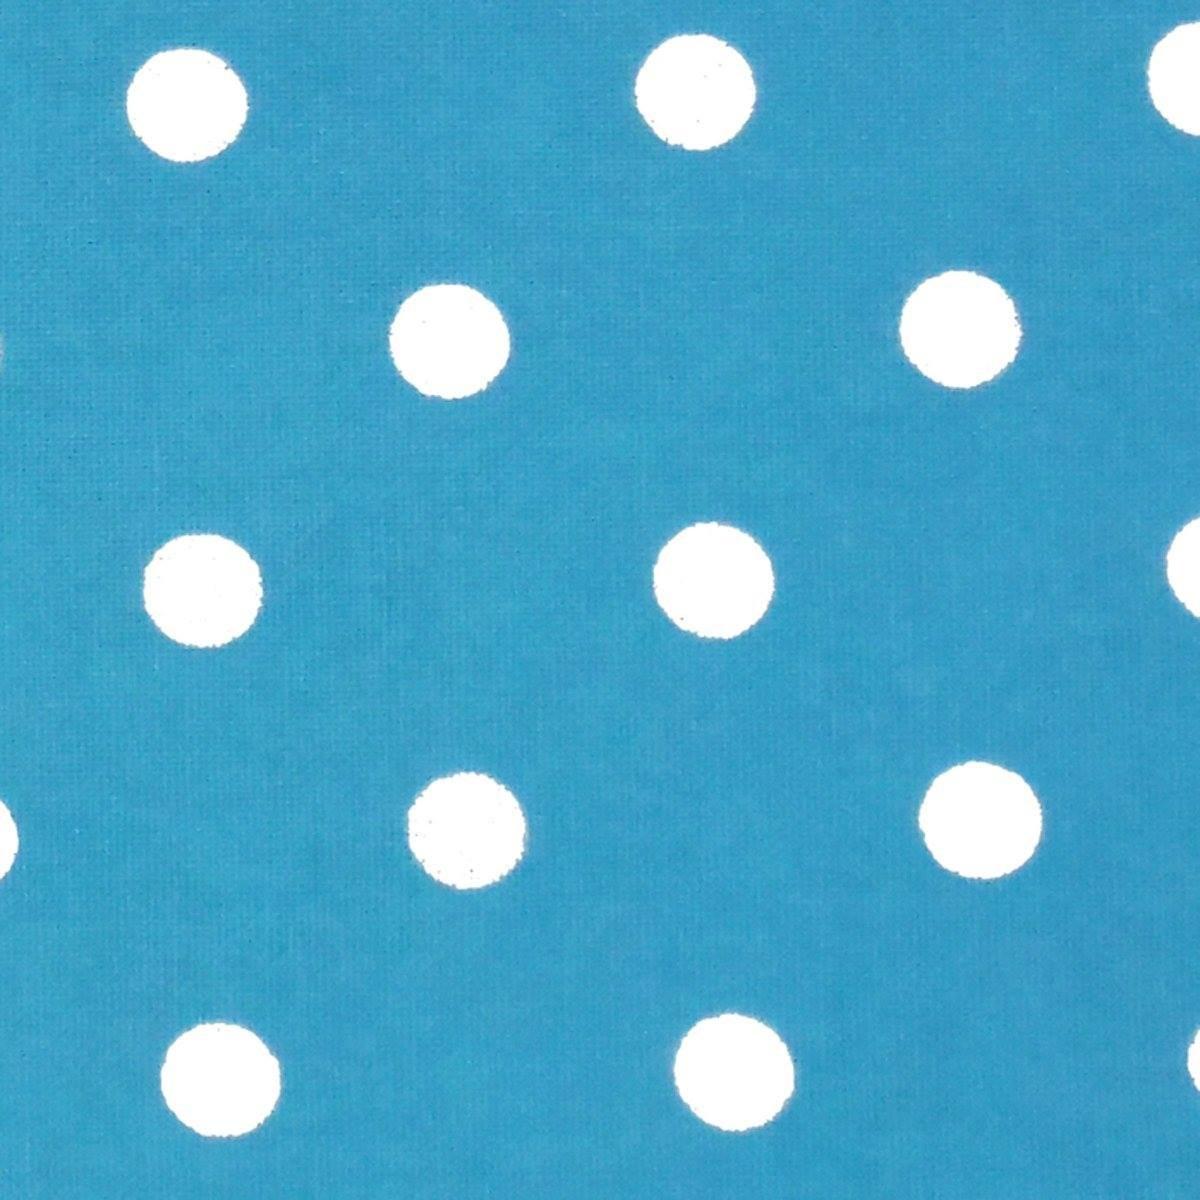 16 Toweling White Polka Dot on Turquoise